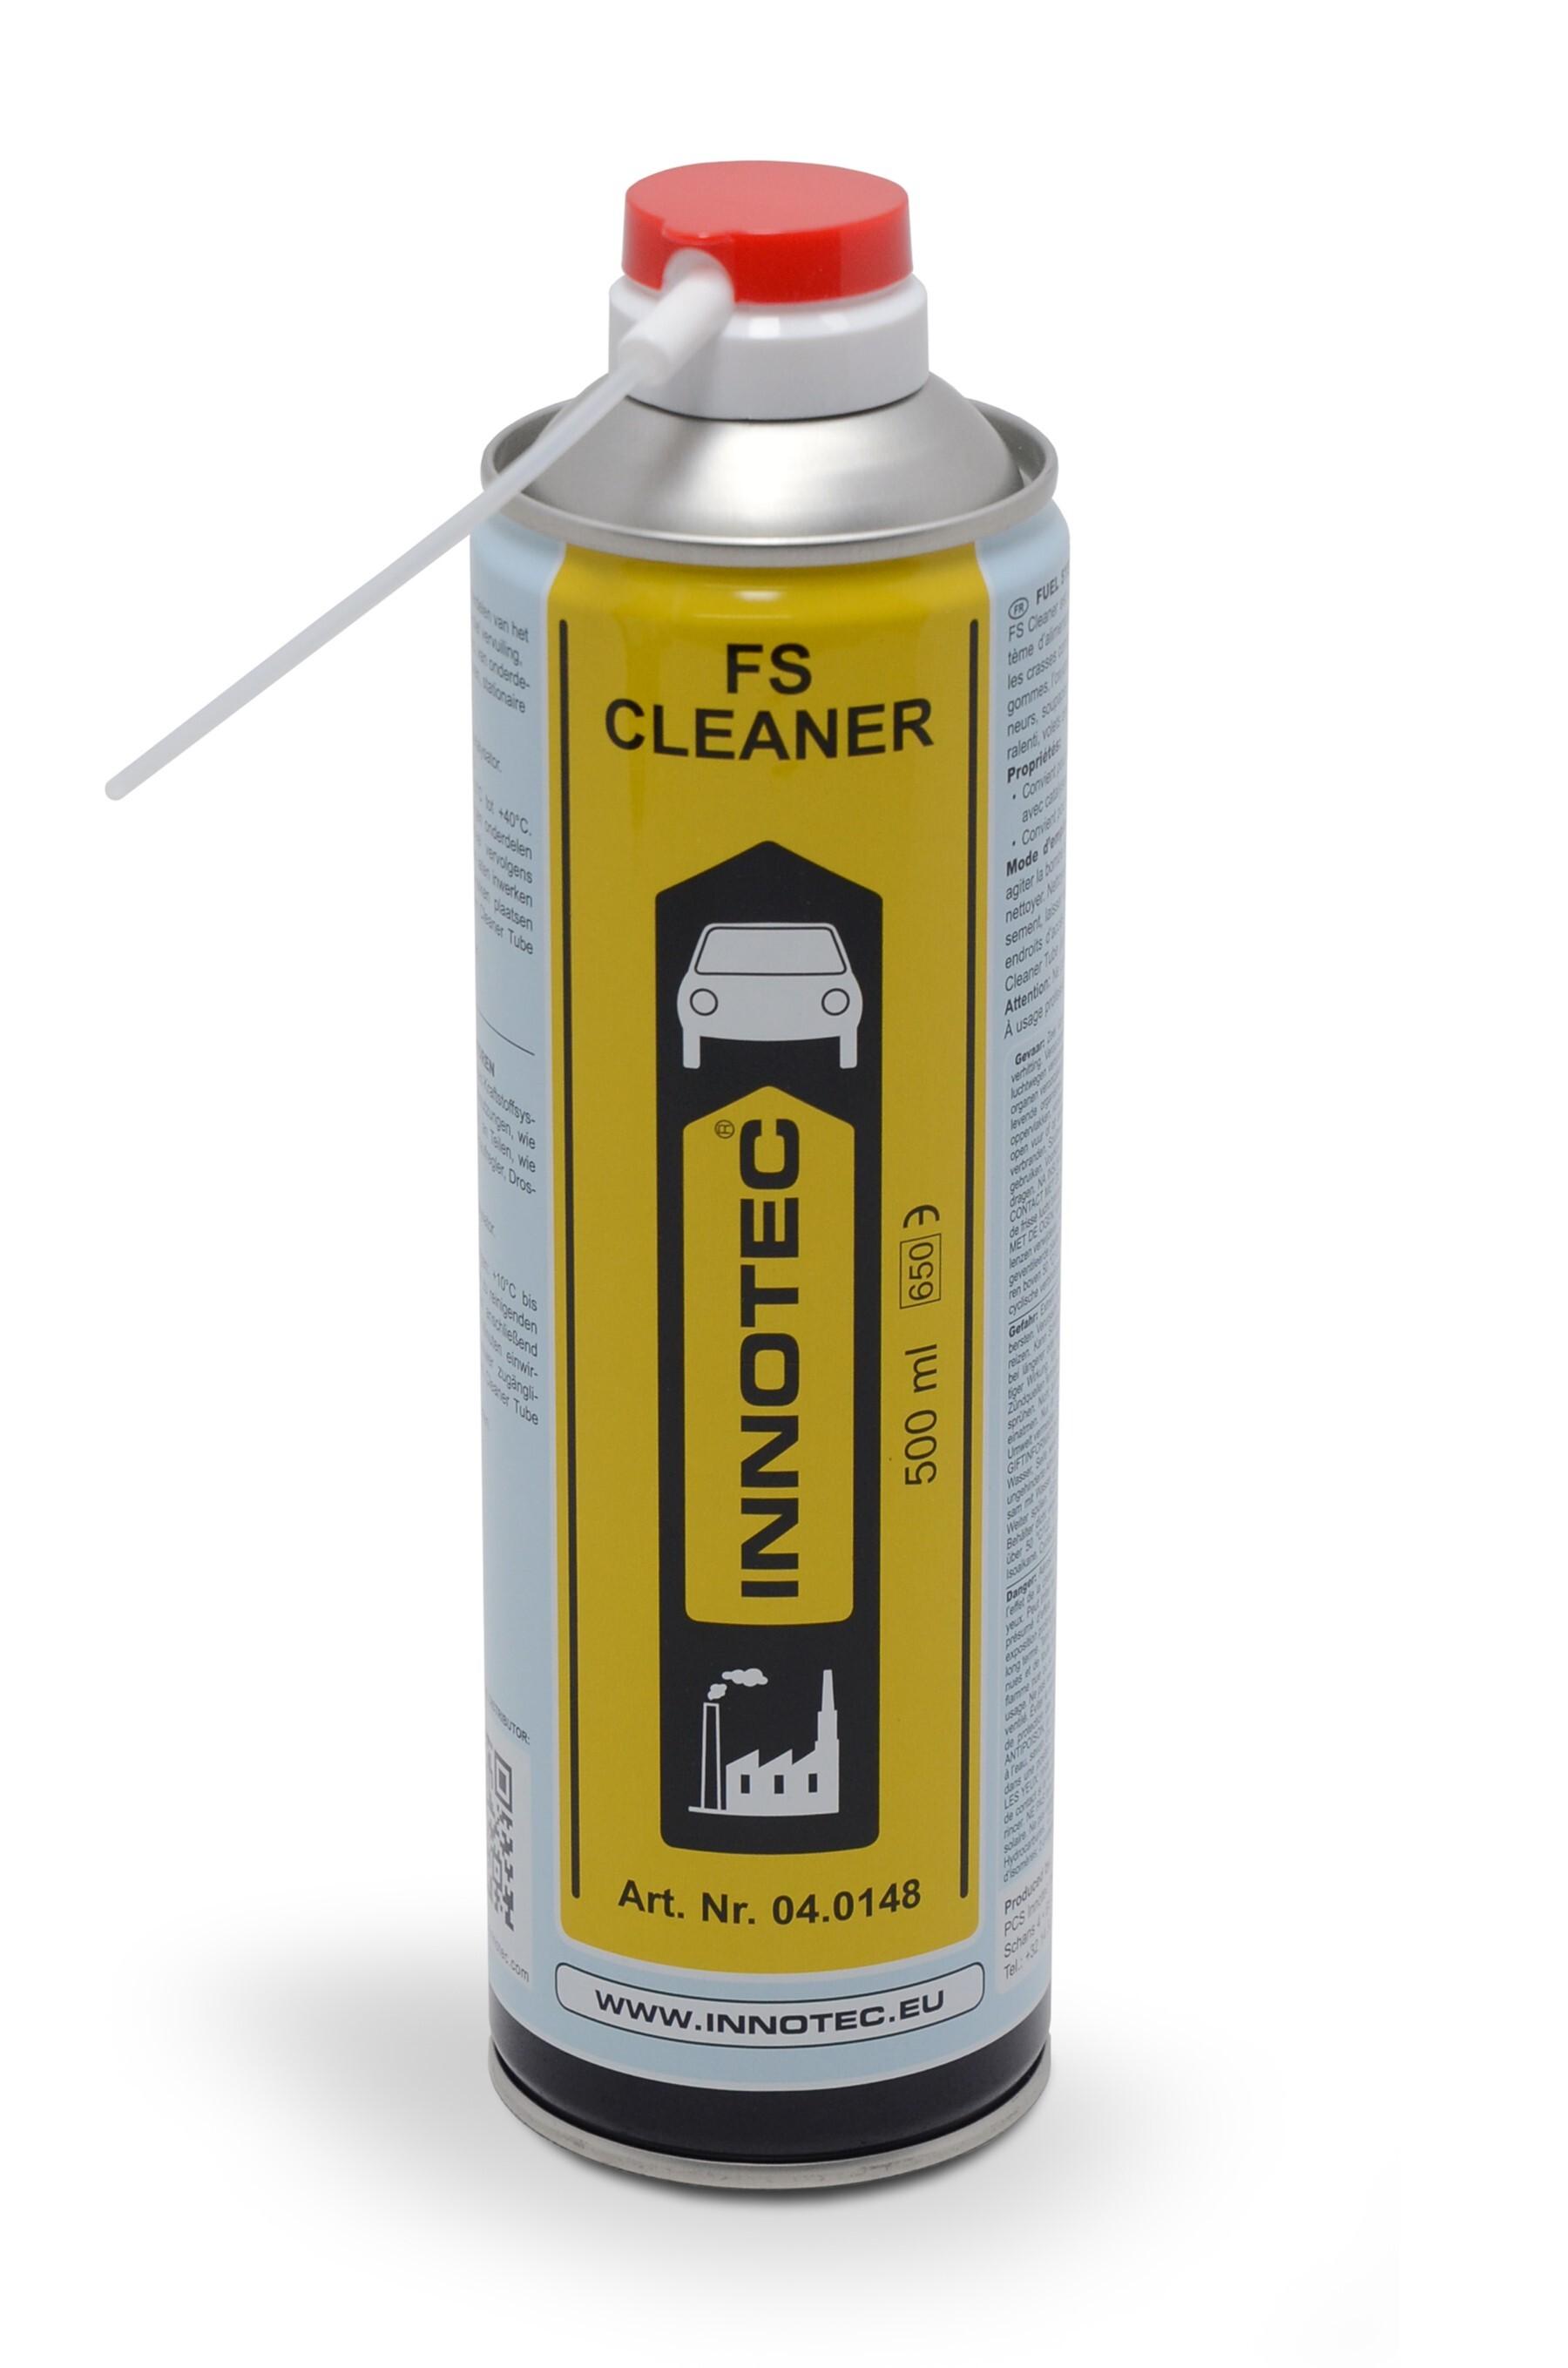 1316 FS Cleaner